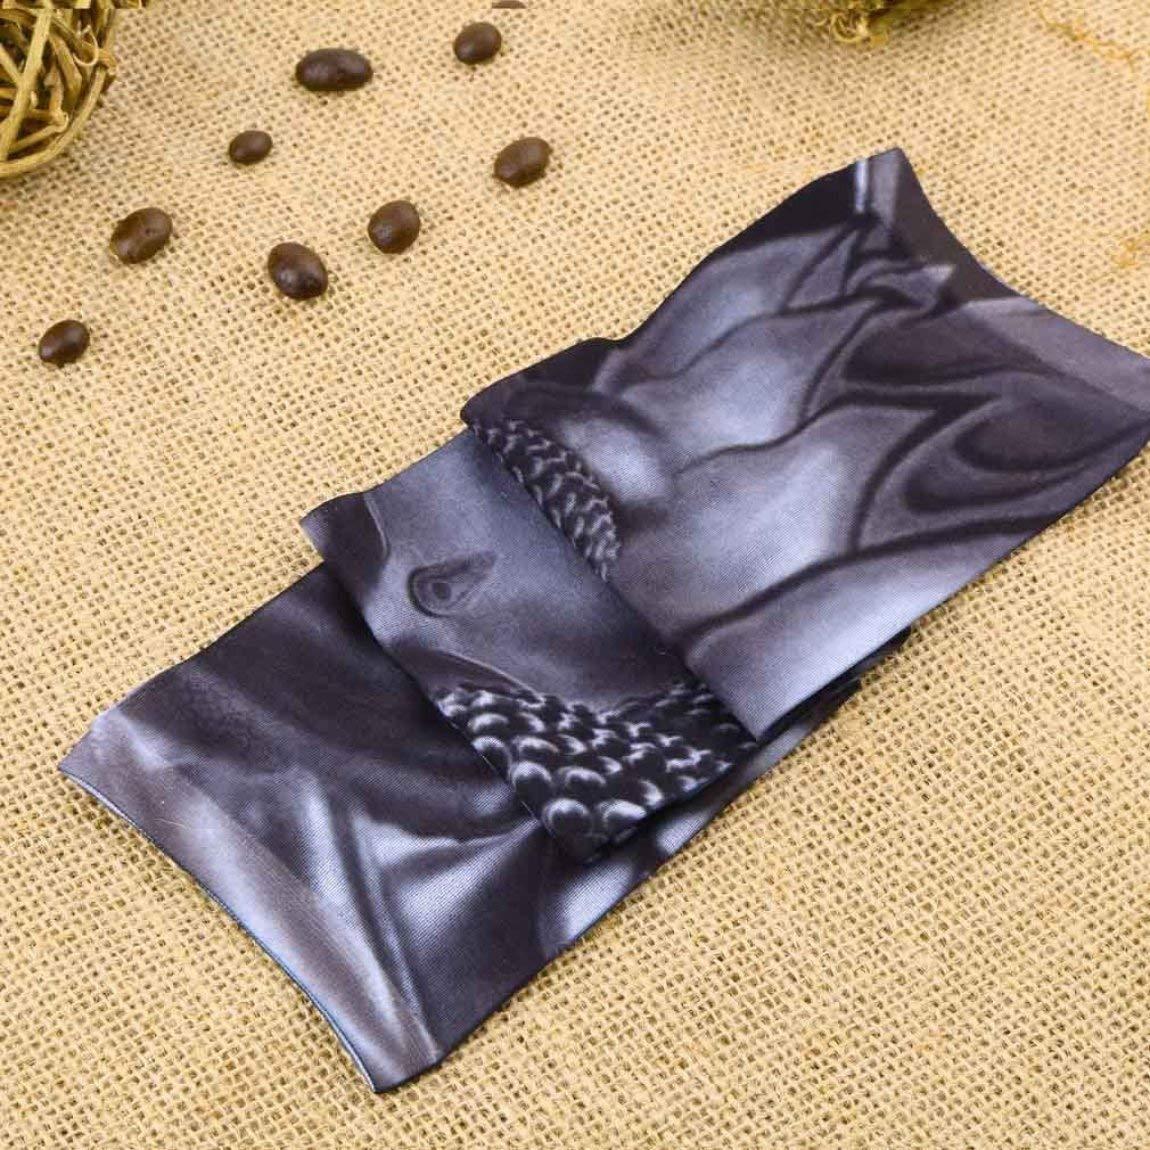 Color tama/ño: W18 73JohnPol 1 Pieza Tatuaje Falso El/ástico Brazo Manga Medias de Brazo Deporte Pieles Protector Solar Impermeable Unisex Hombro Manga de Tatuaje Hombre Mujer